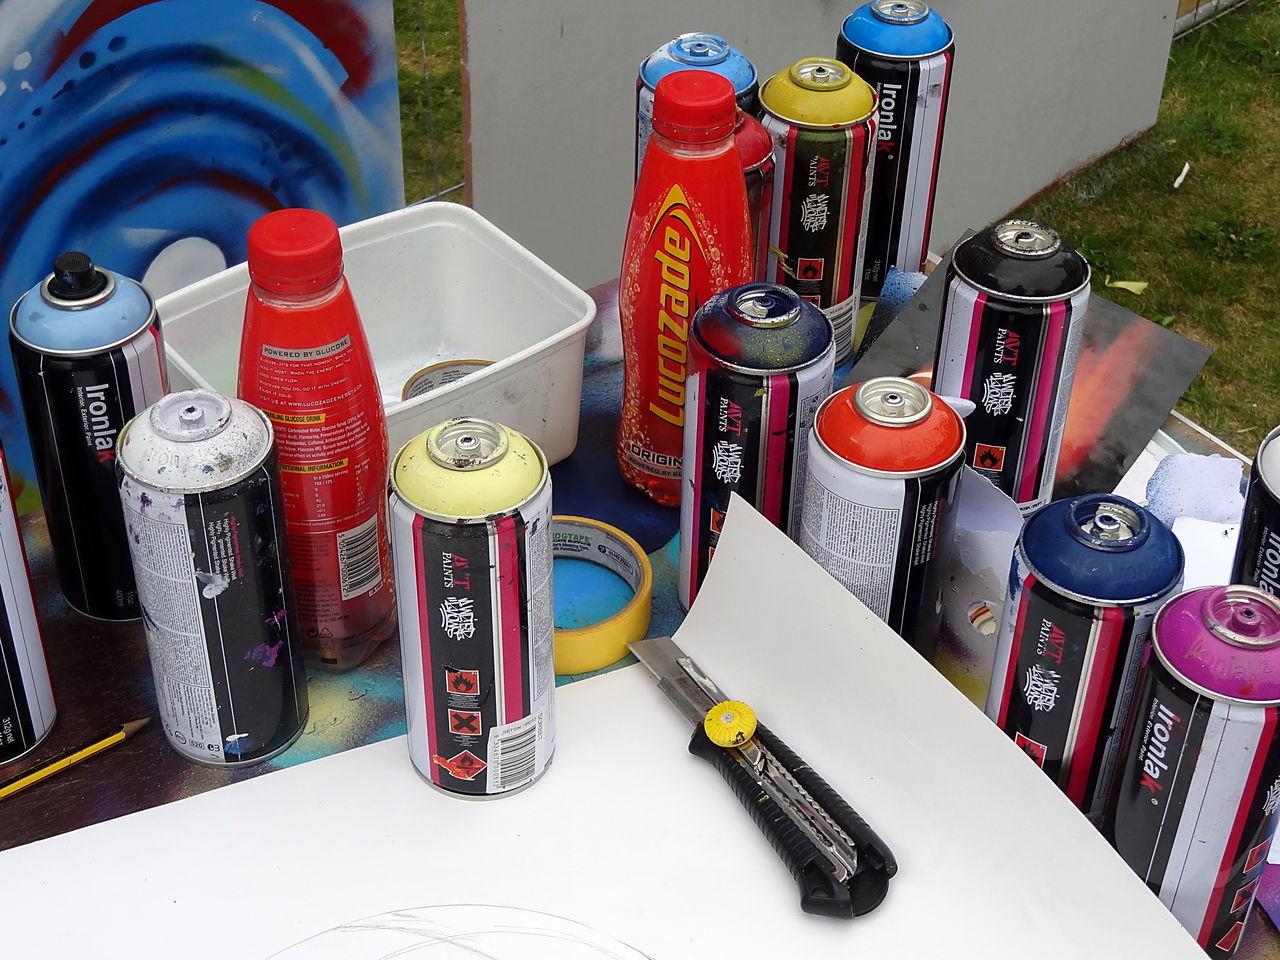 Spray Jam 2016 Aerosol Aerosolart Art Cans Gear Spray Jam Street Art Tools Tools Of The Trade